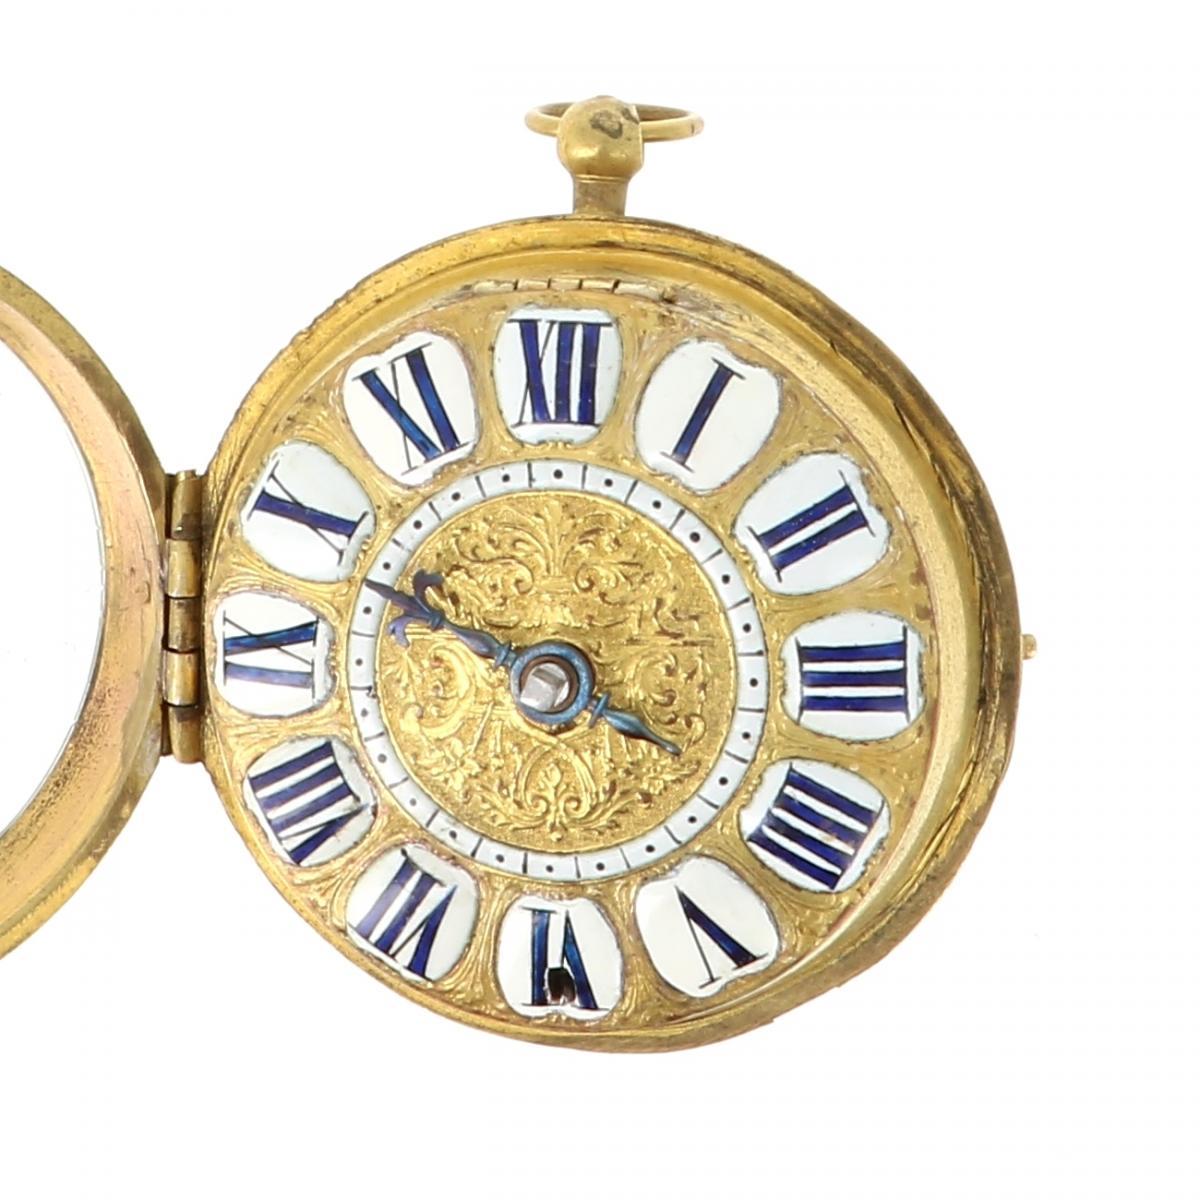 Horlogerie Eric Lambay